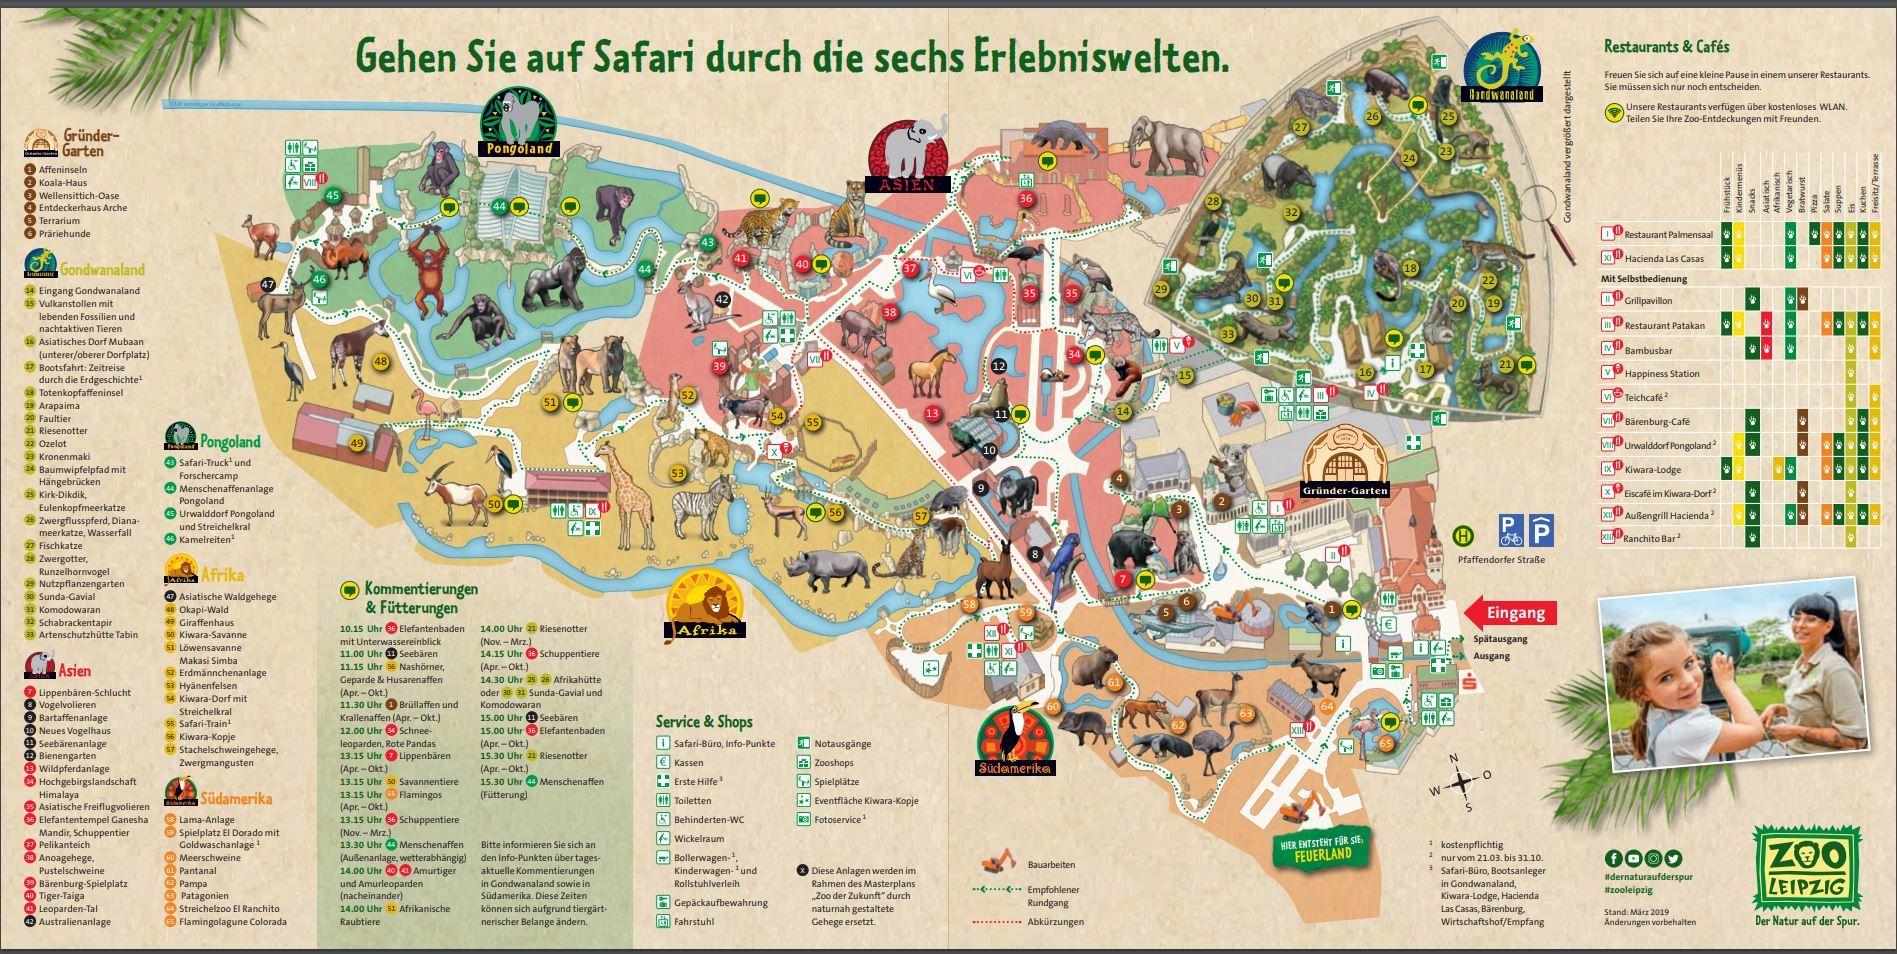 Zoo Leipzig Tickets Premium Hotel Ab 49 Travelcircus